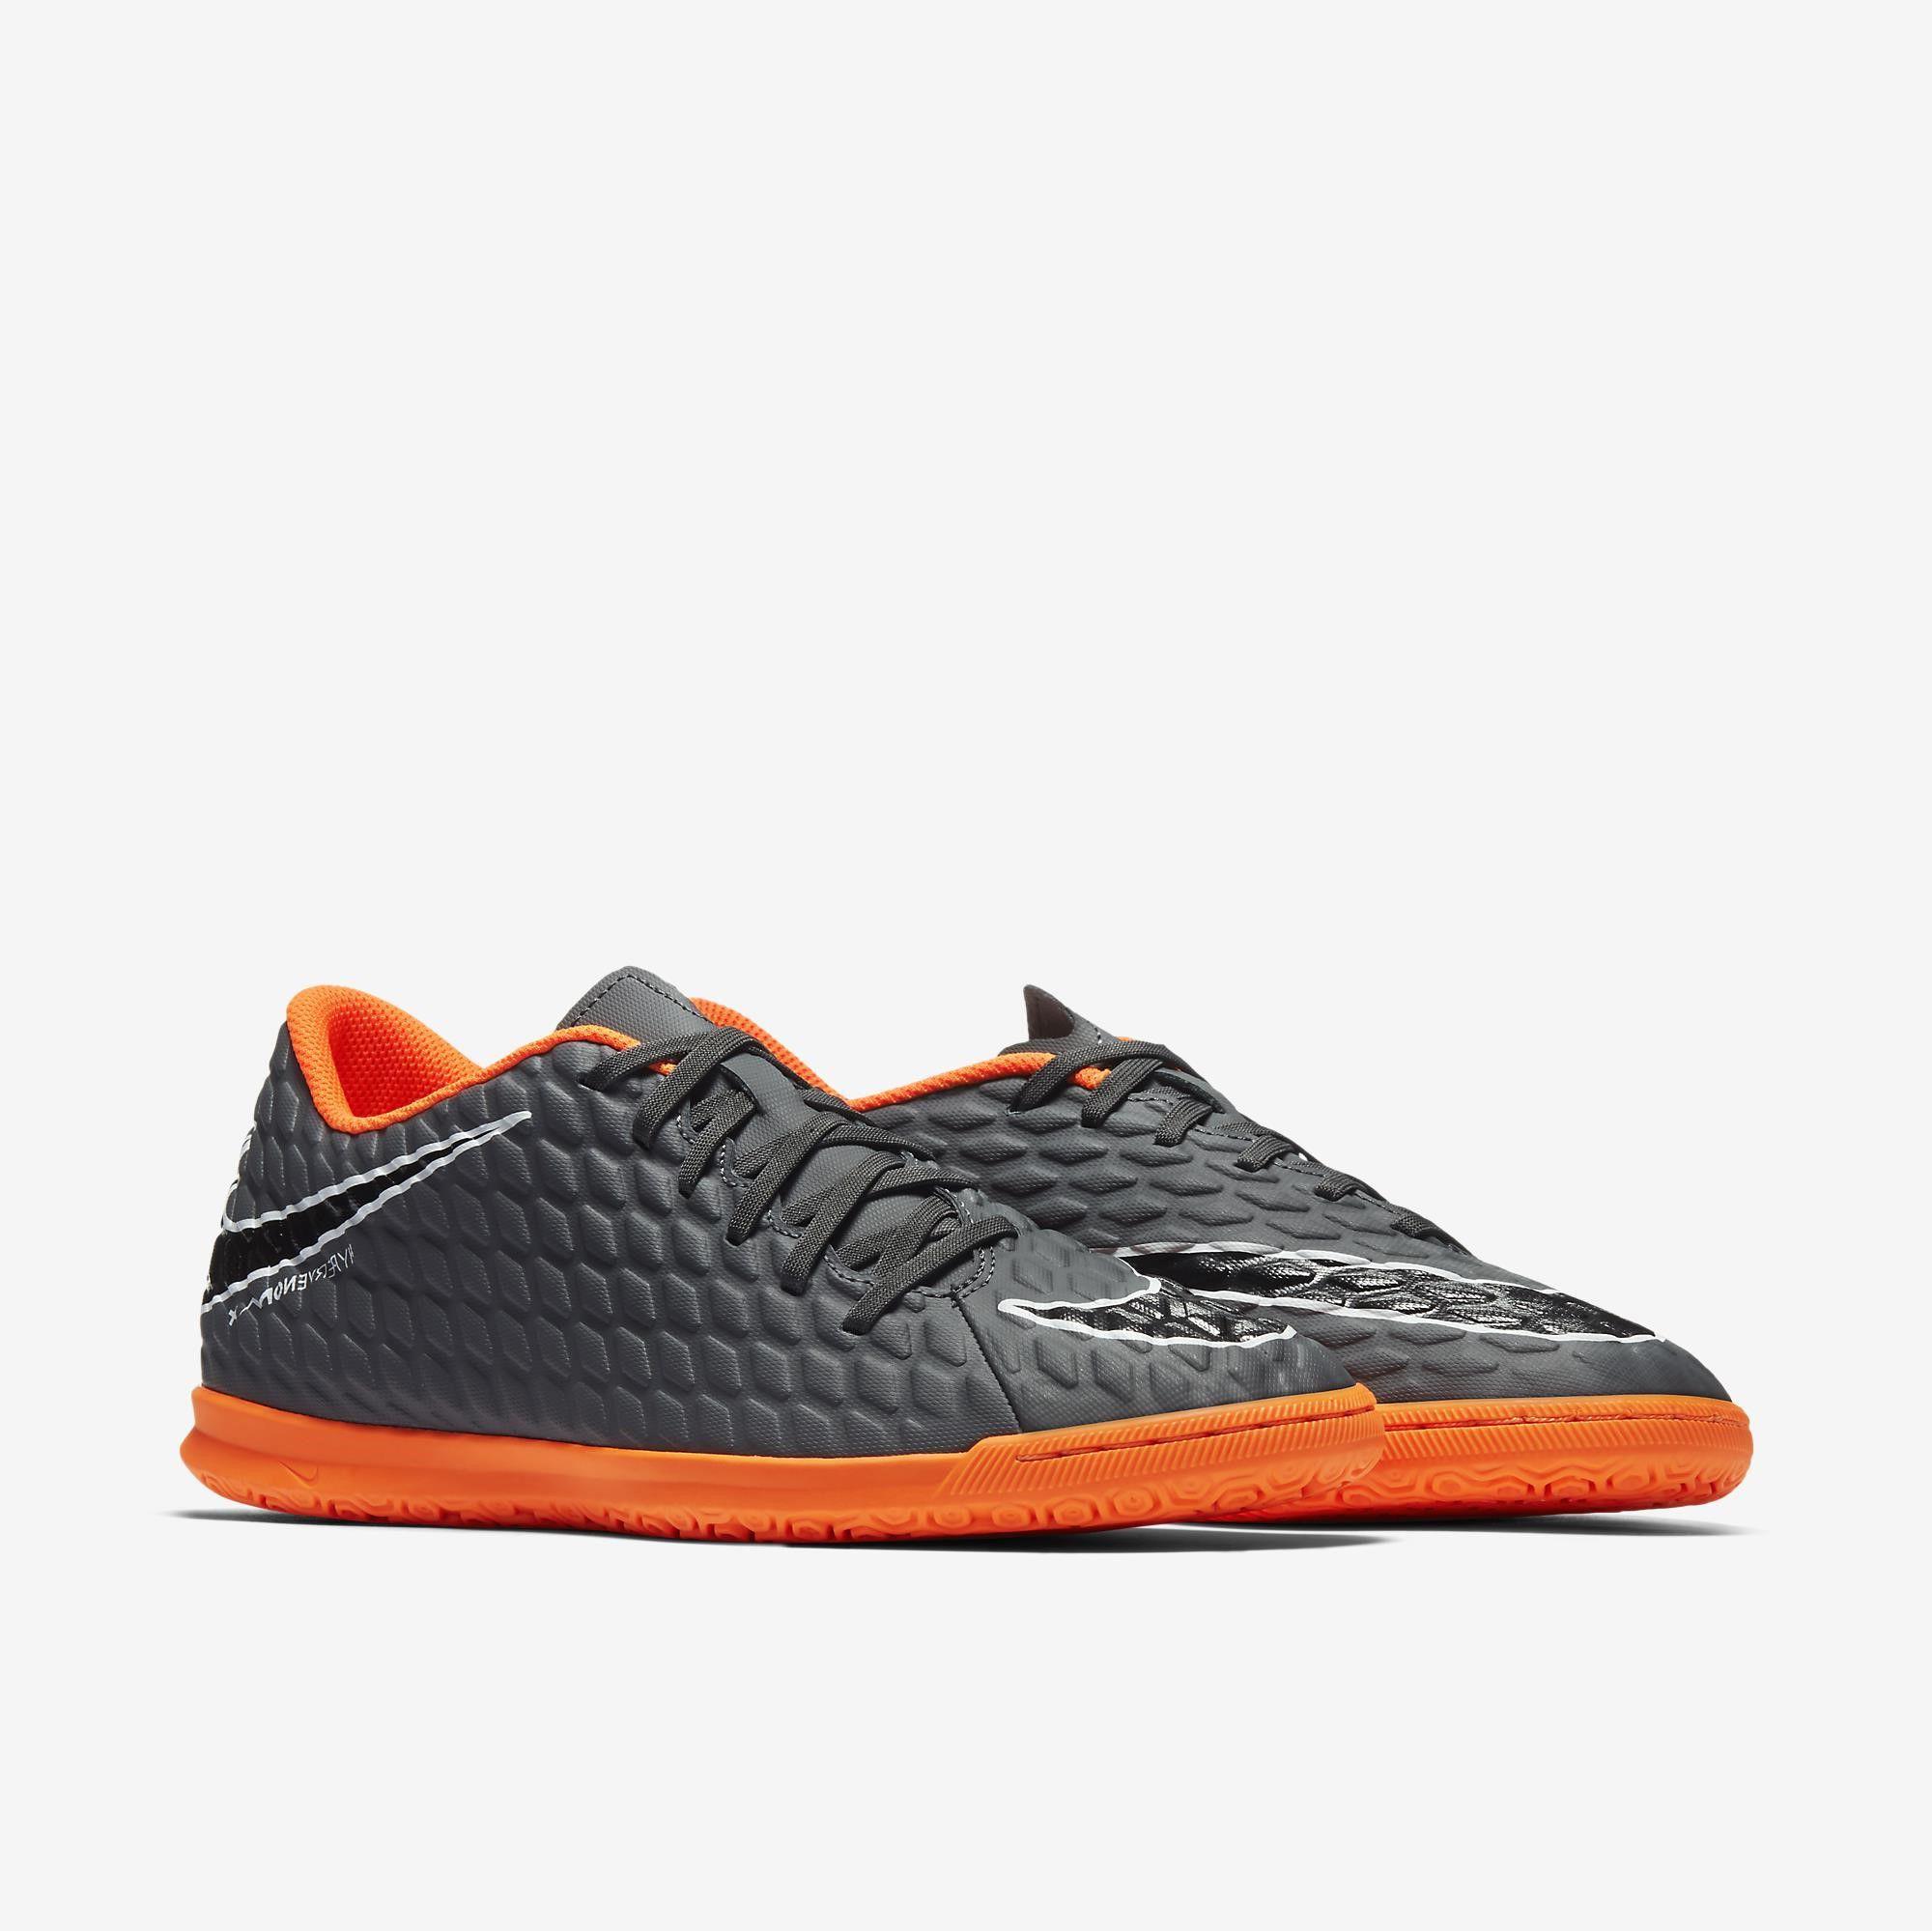 Chuteira Nike Hypervenom Phantomx 3 Cl Futsal - BRACIA SHOP  Loja de ... 20f4f5faa523c